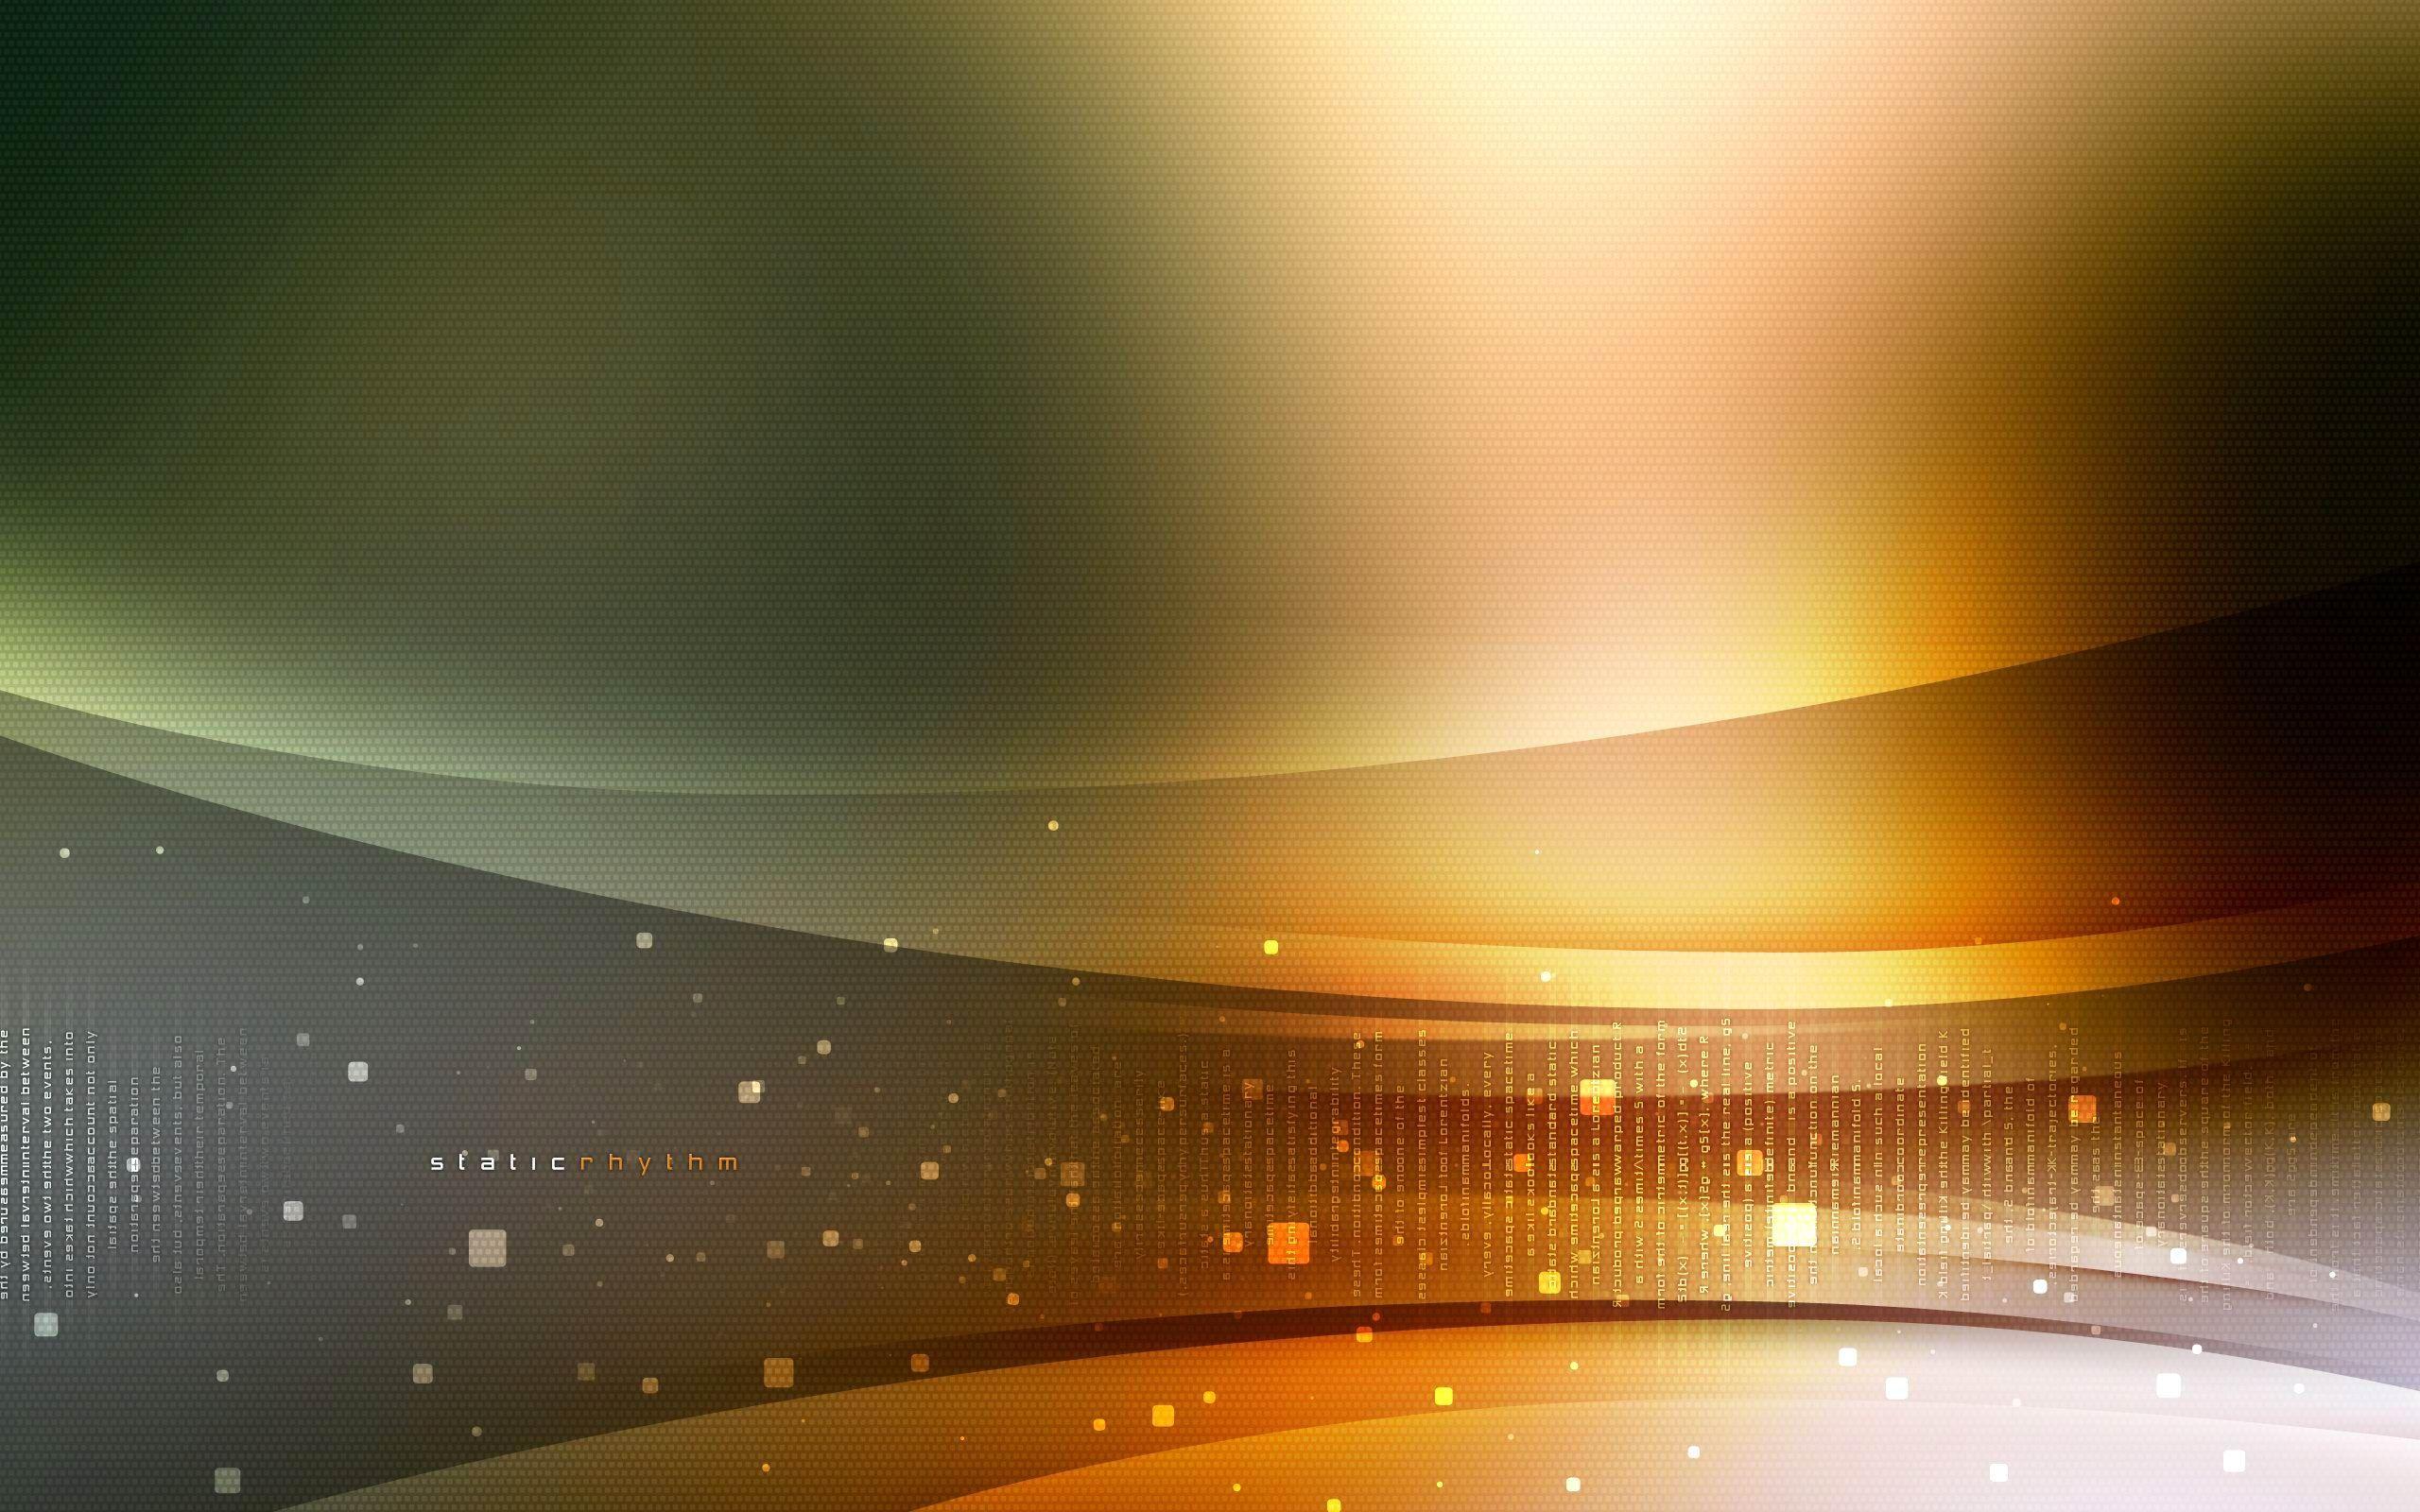 violet blurry background hd desktop wallpaper high definition | hd